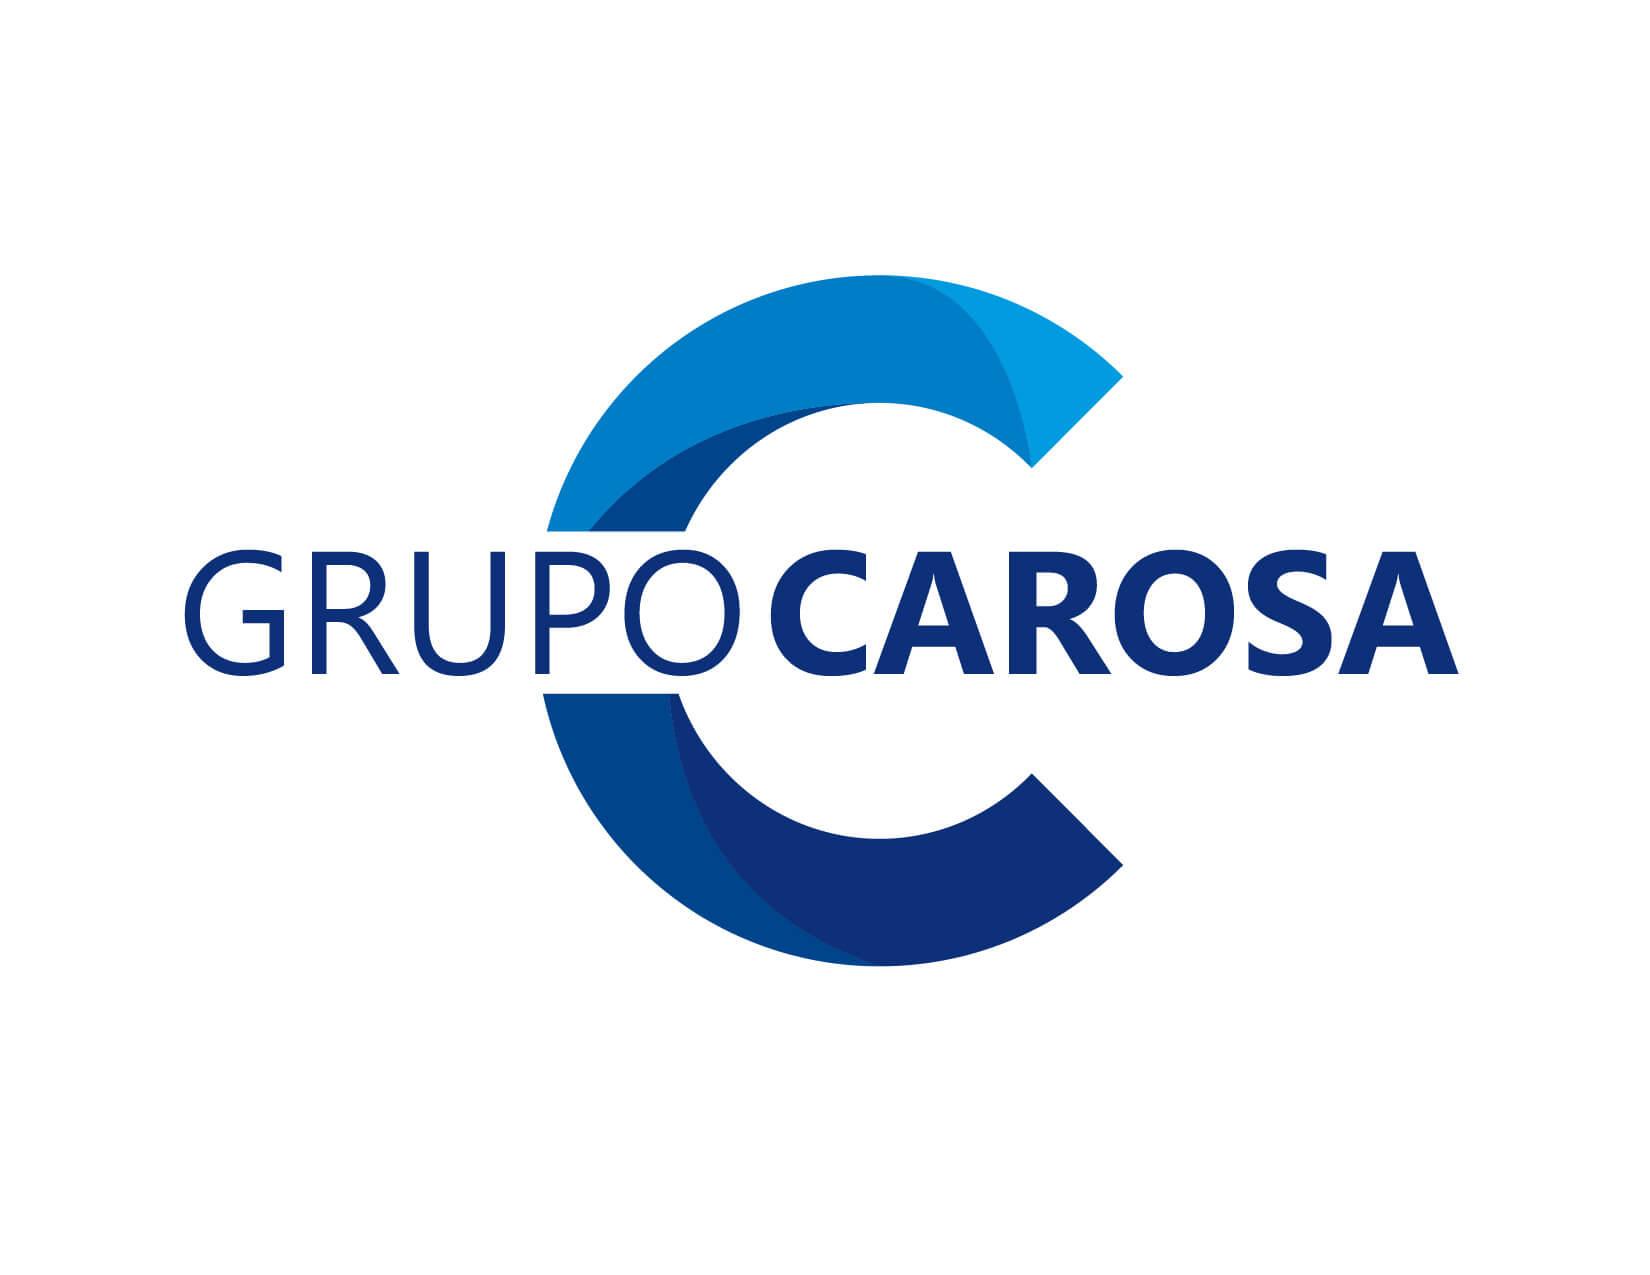 Grupo Carosa